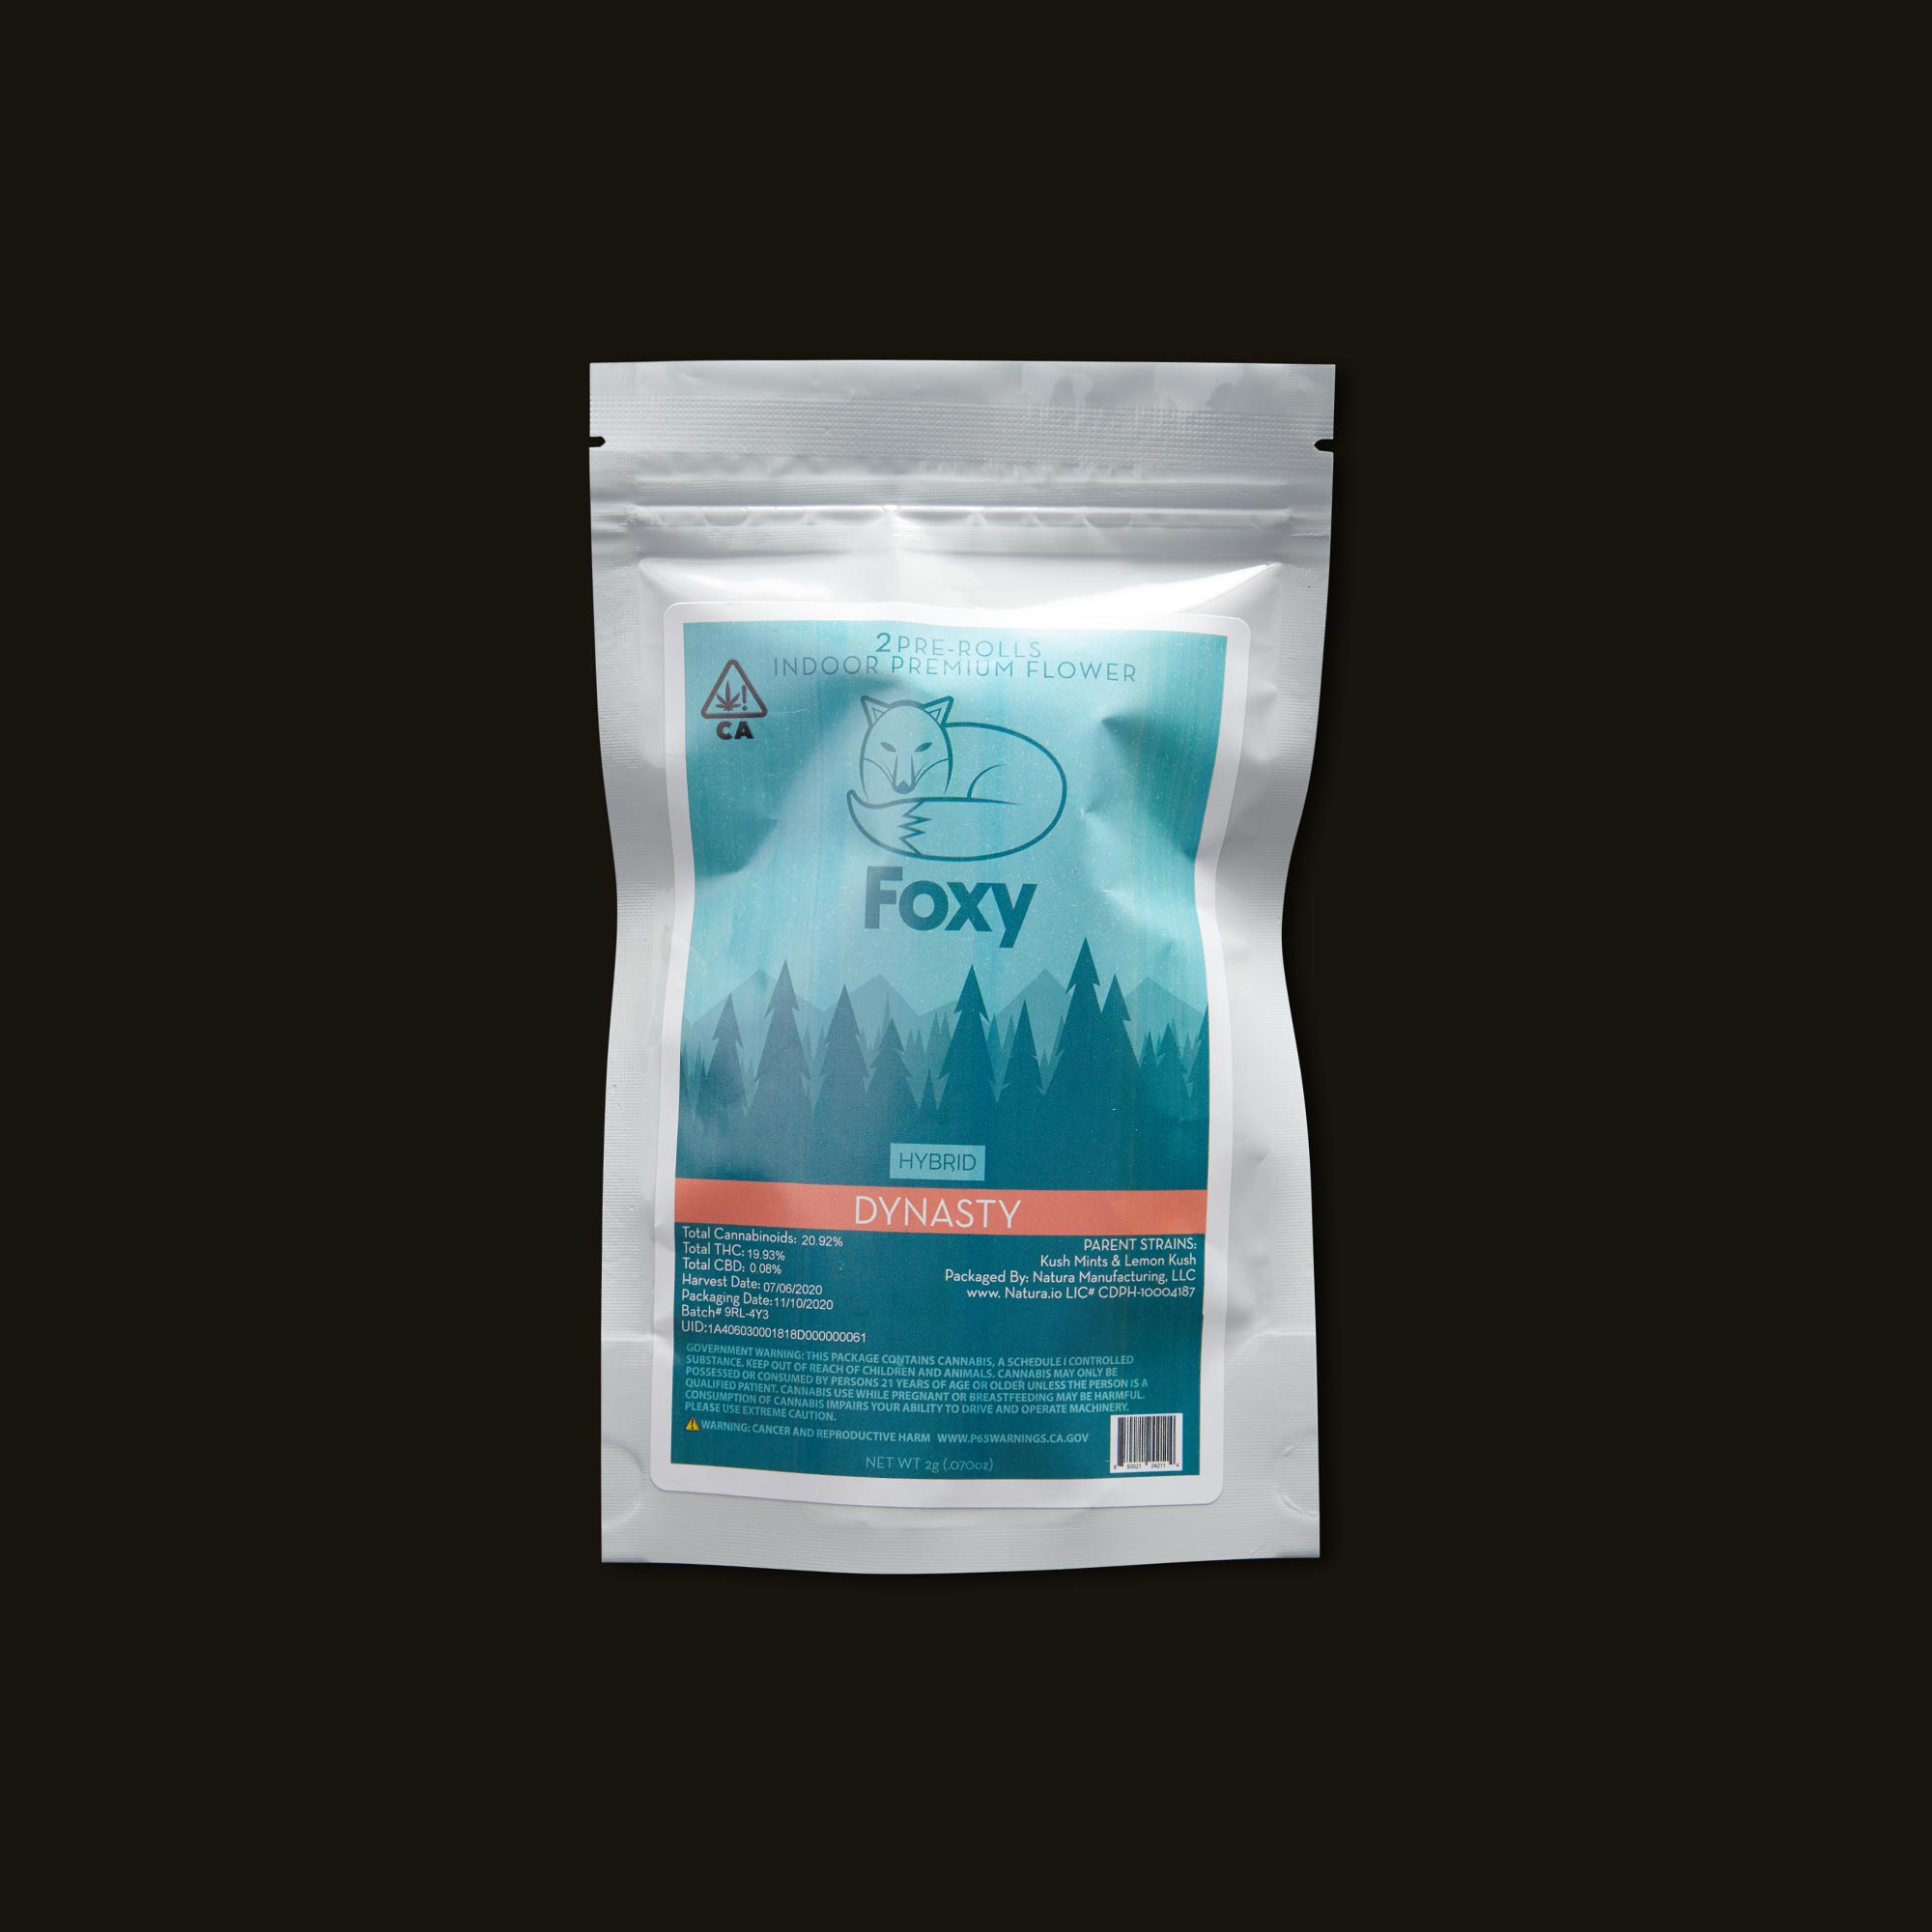 Foxy Dynasty Pre-Rolls Front Packaging